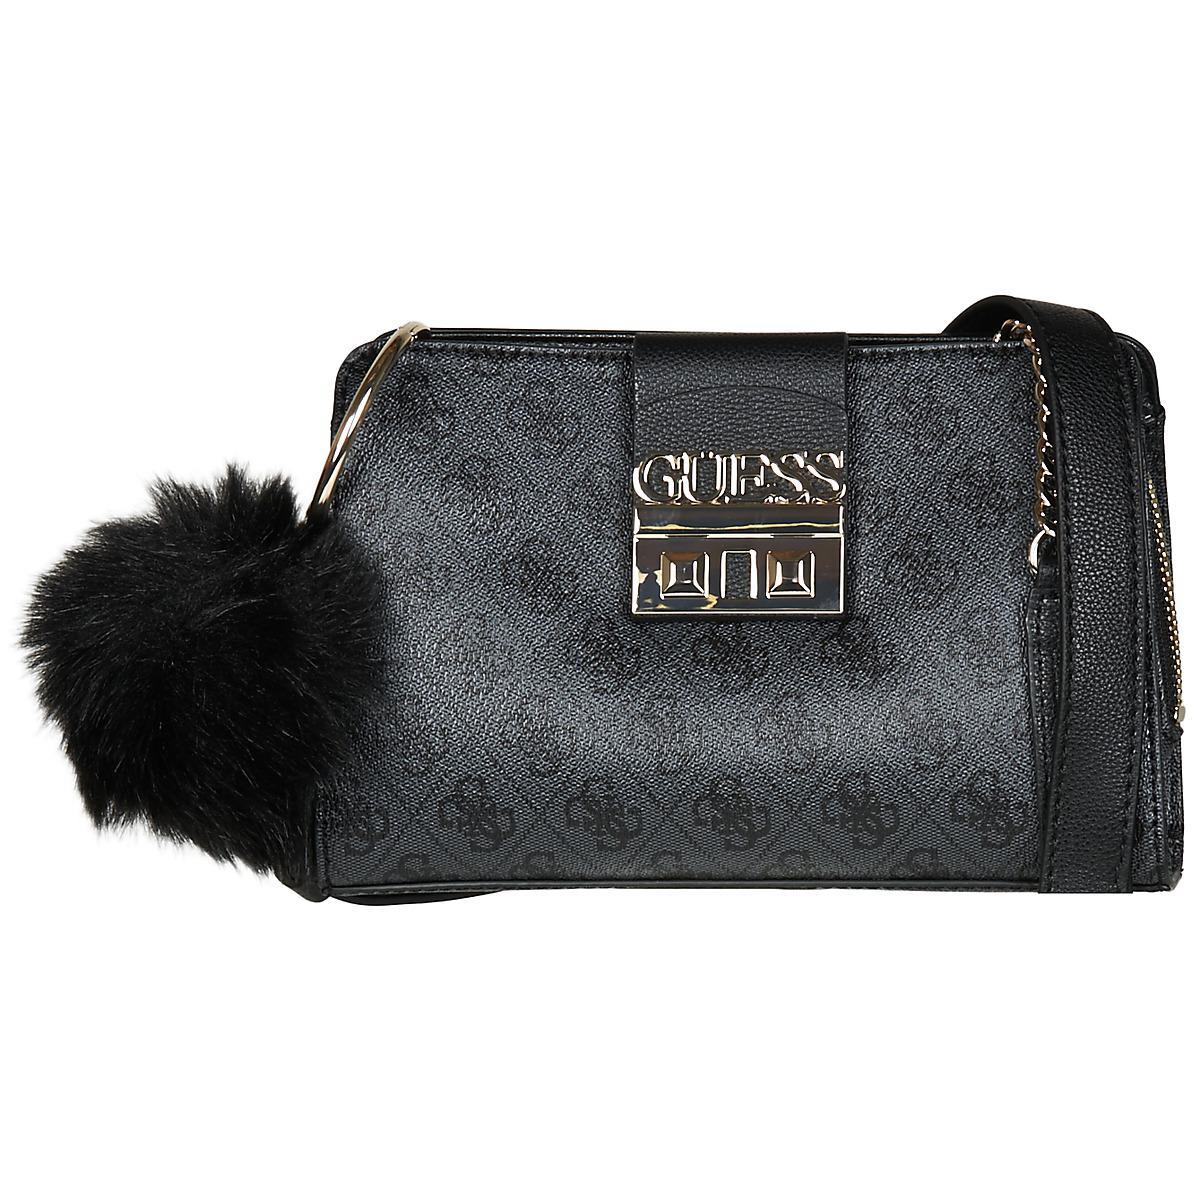 Guess Logo Luxe Crossbody Girlfriend Women s Shoulder Bag In Black ... 450e48c282